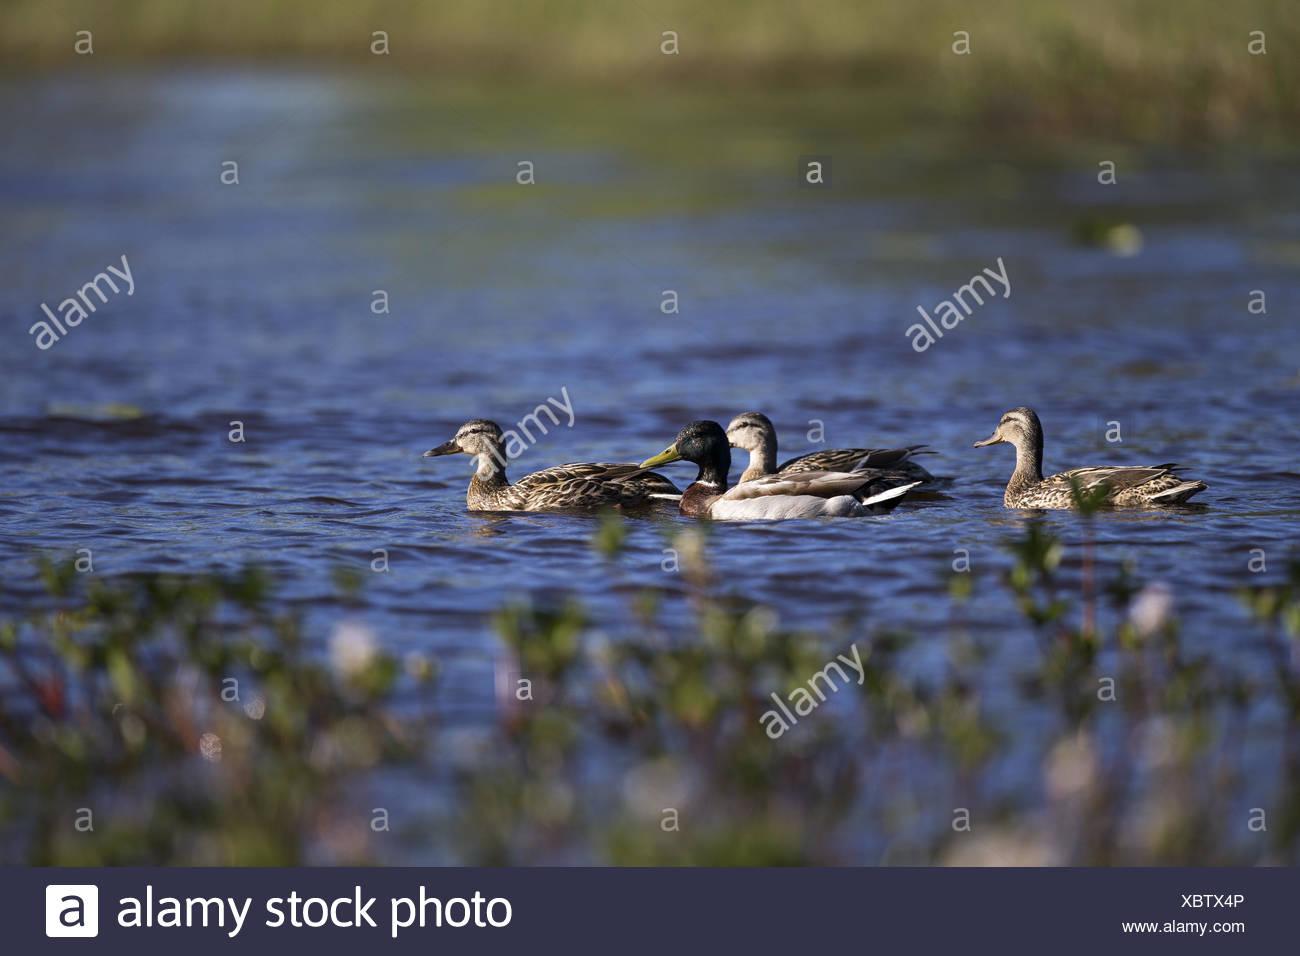 mallards in the nationalpark Hamra - Stock Image